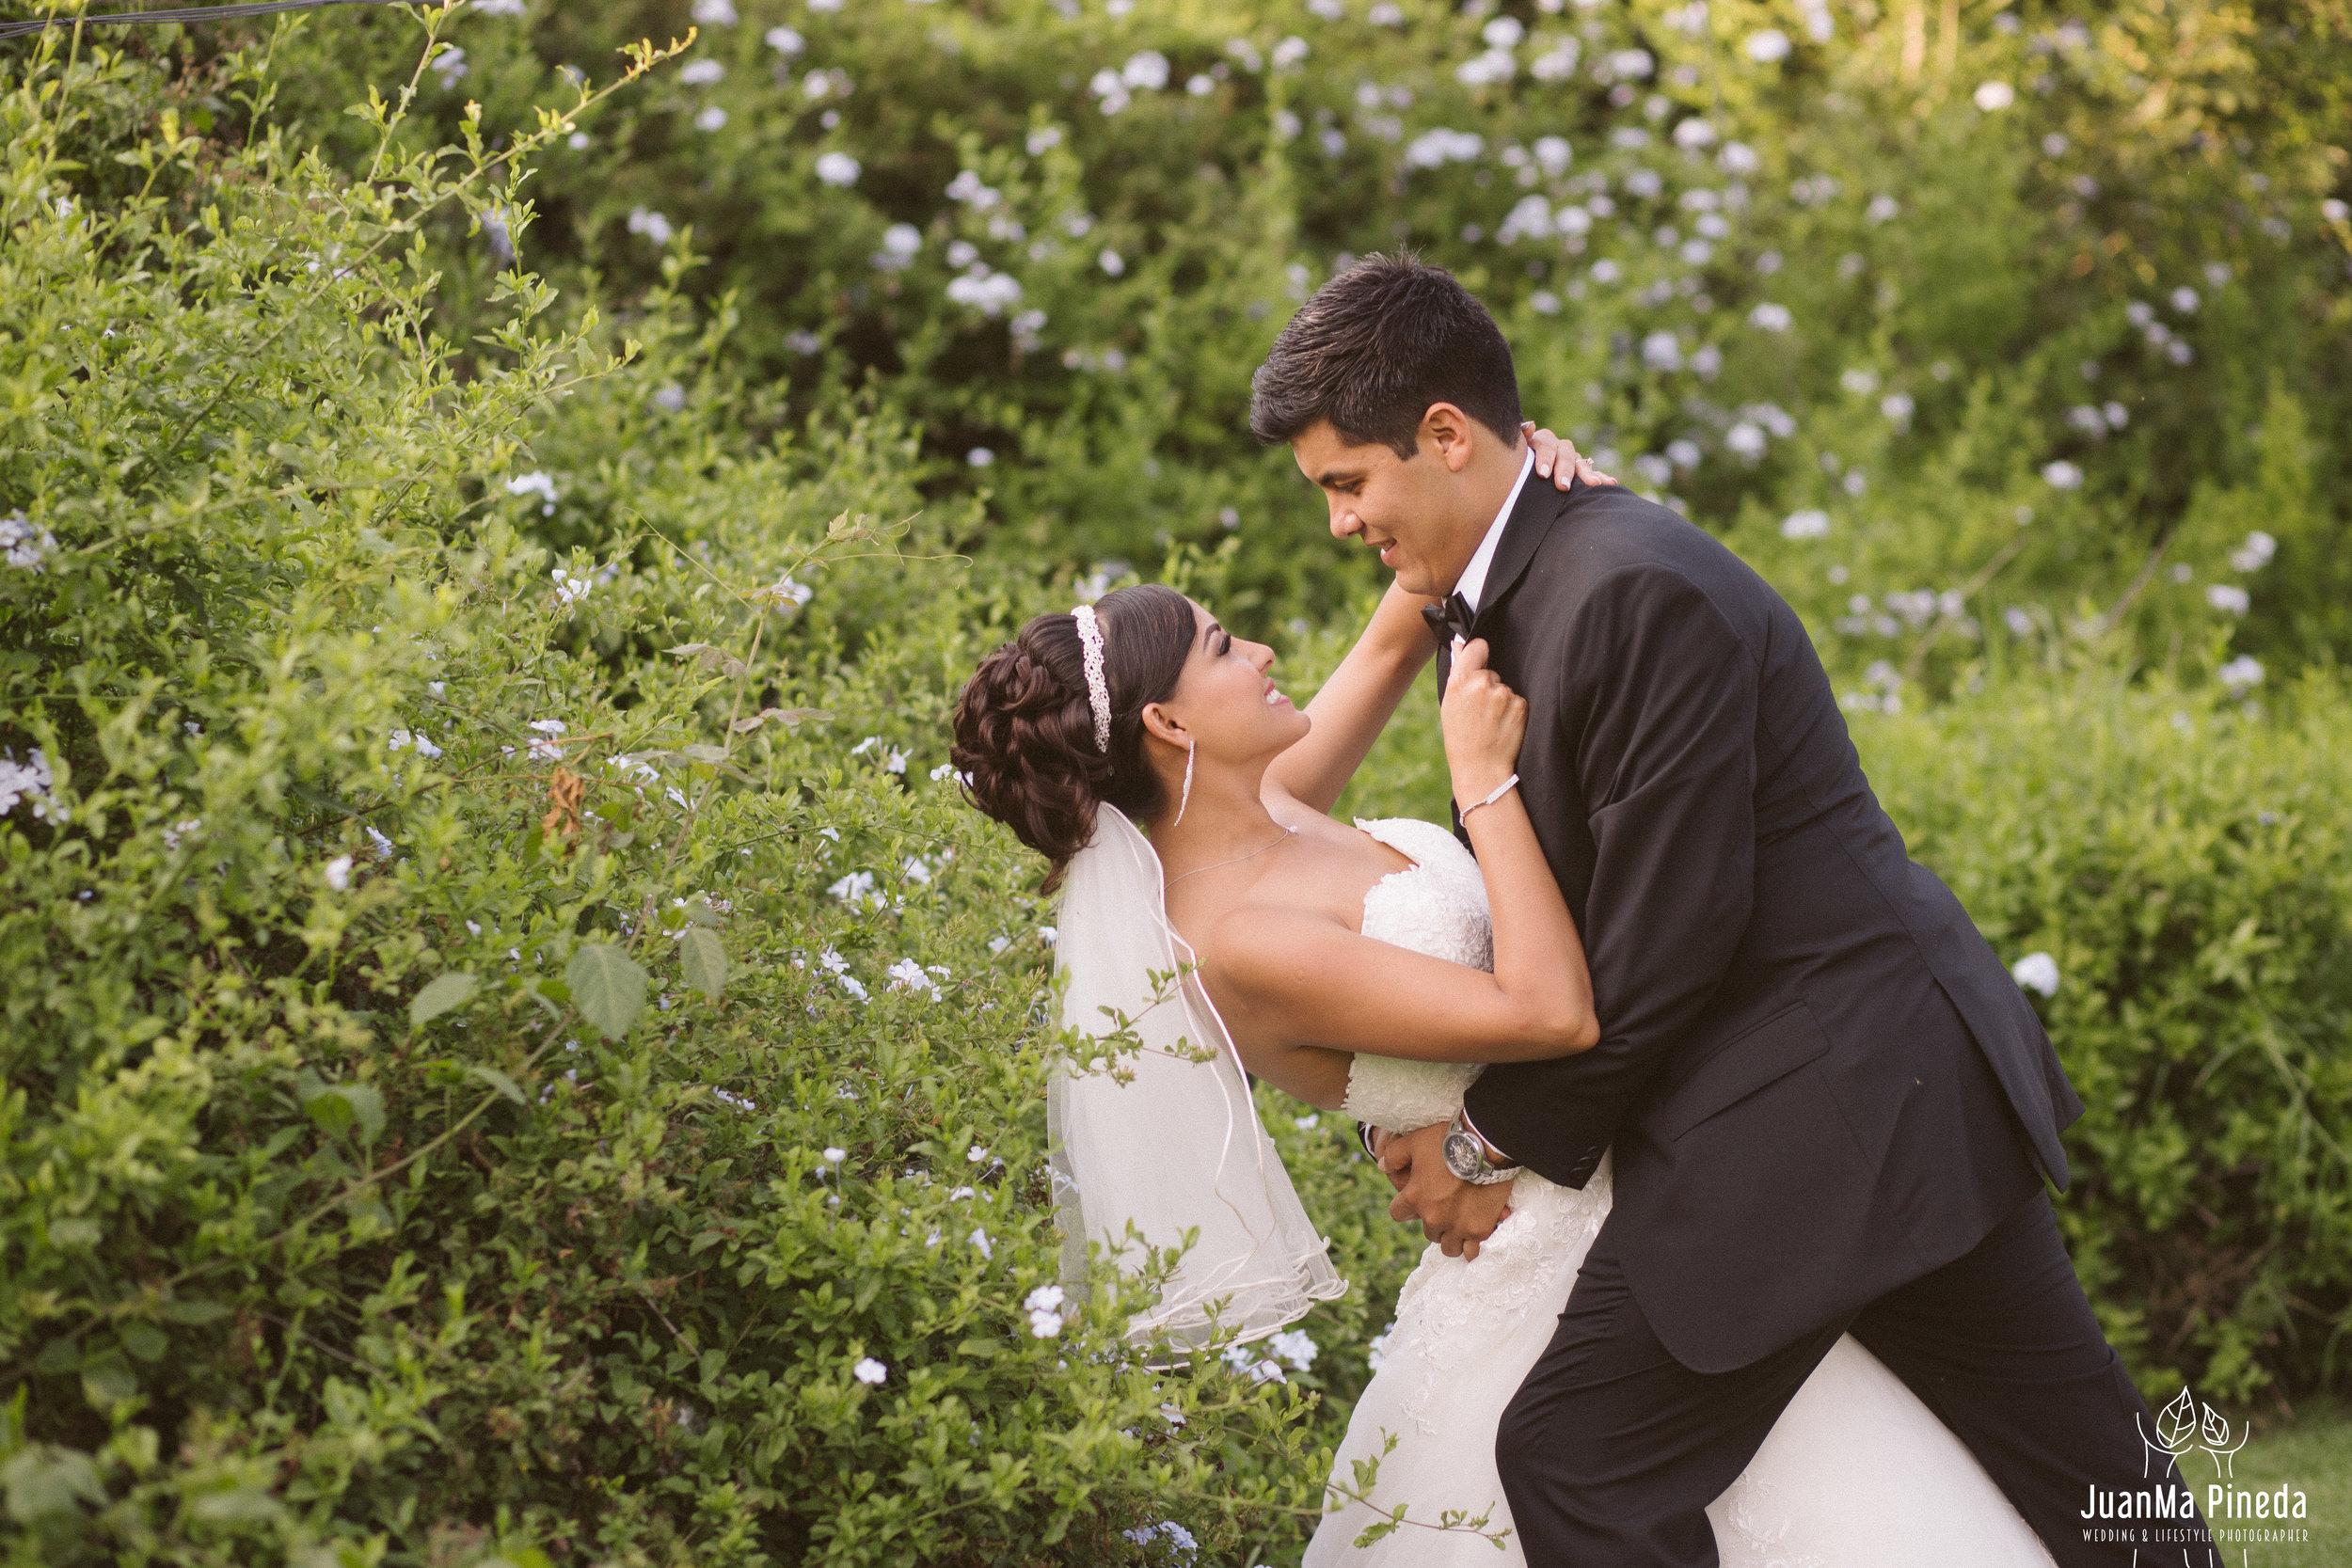 Wedding+Photographer+Mexico-1.jpg